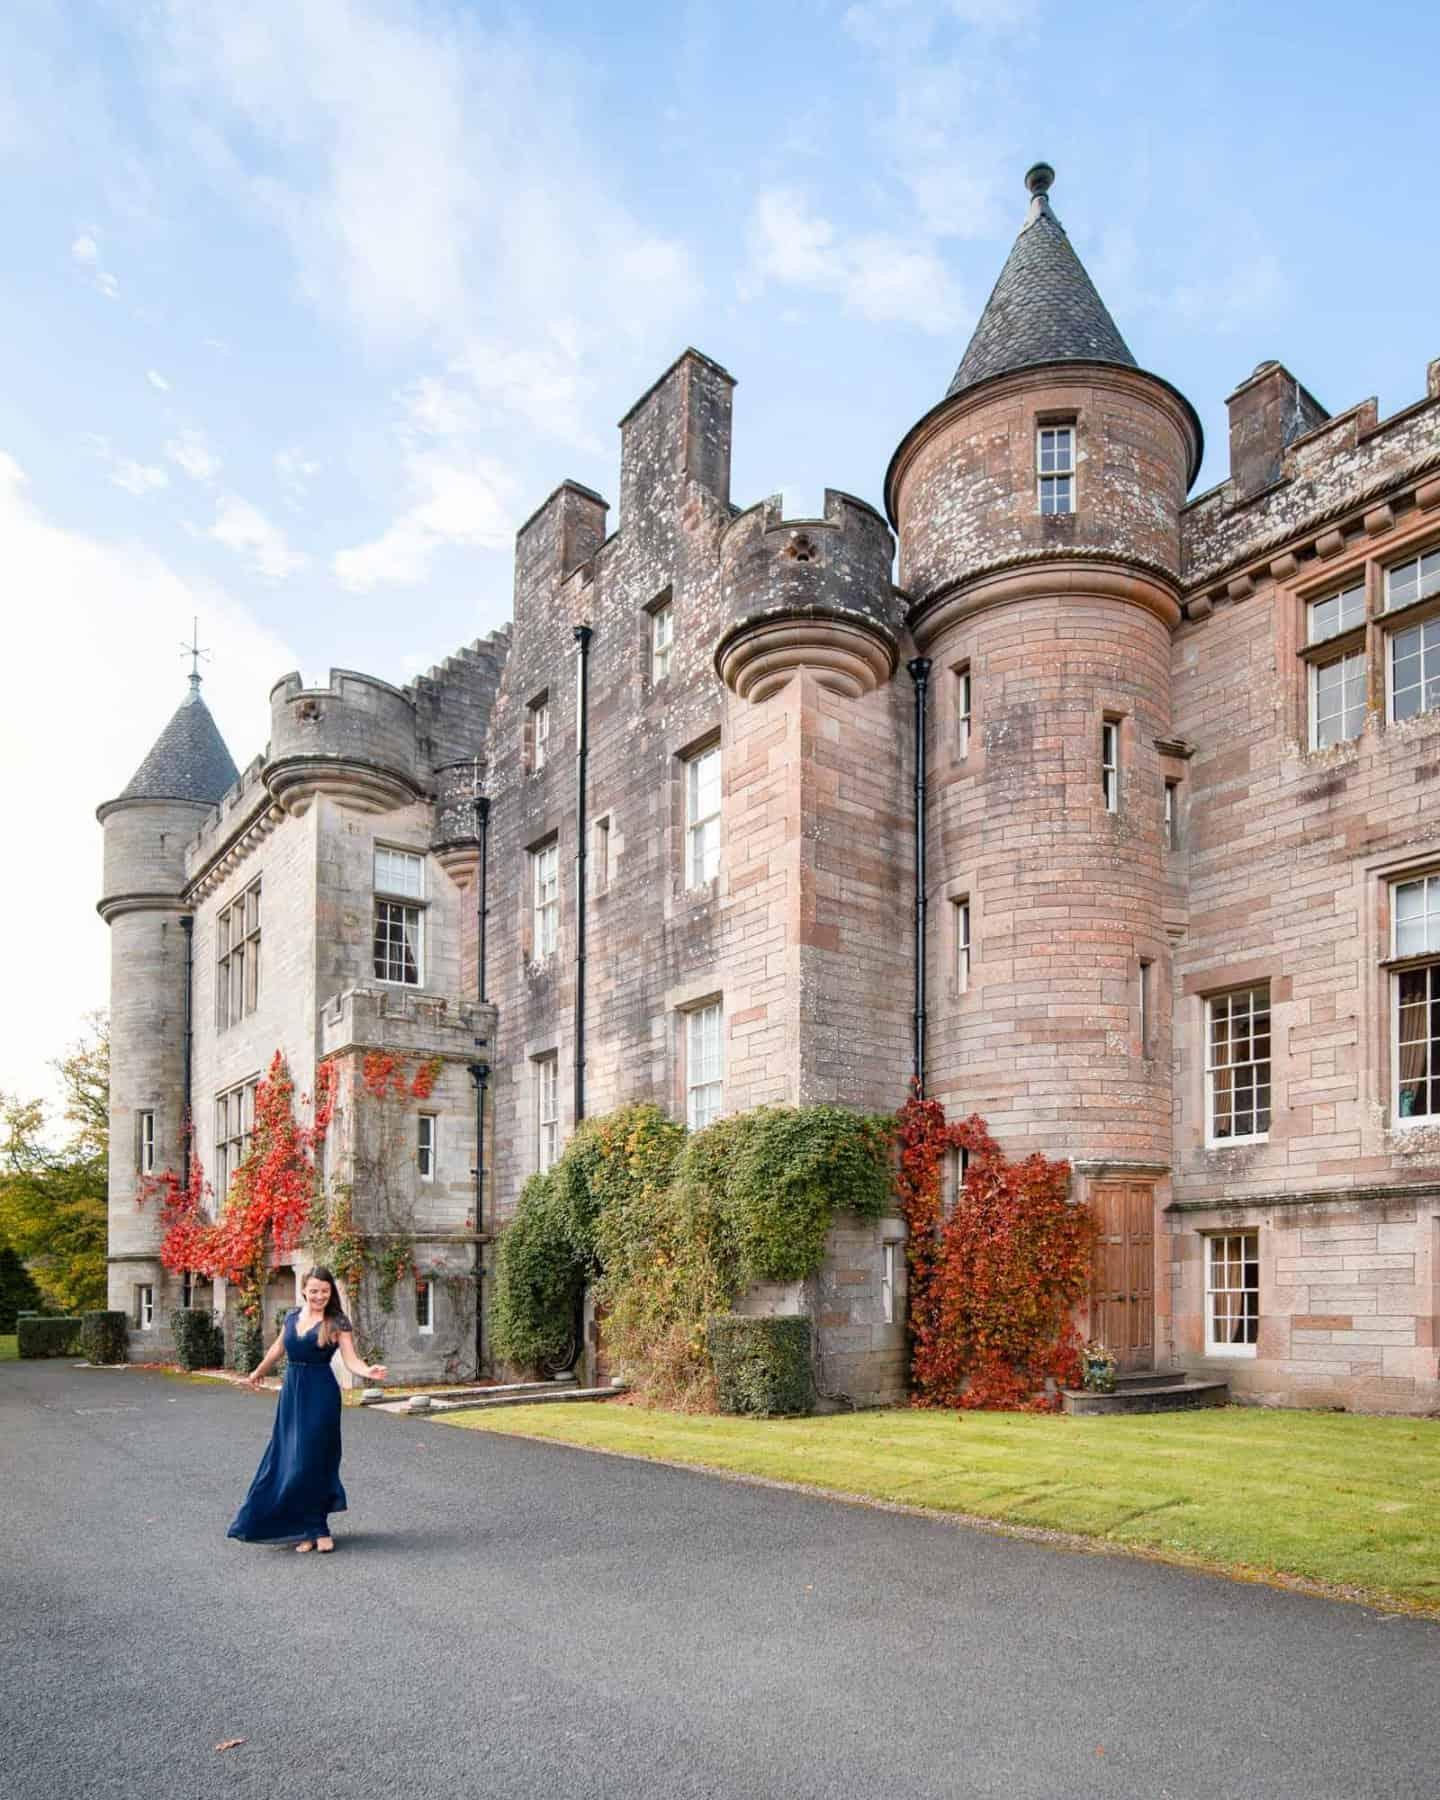 Travels of Sophie dancing in front of Glenapp Castle